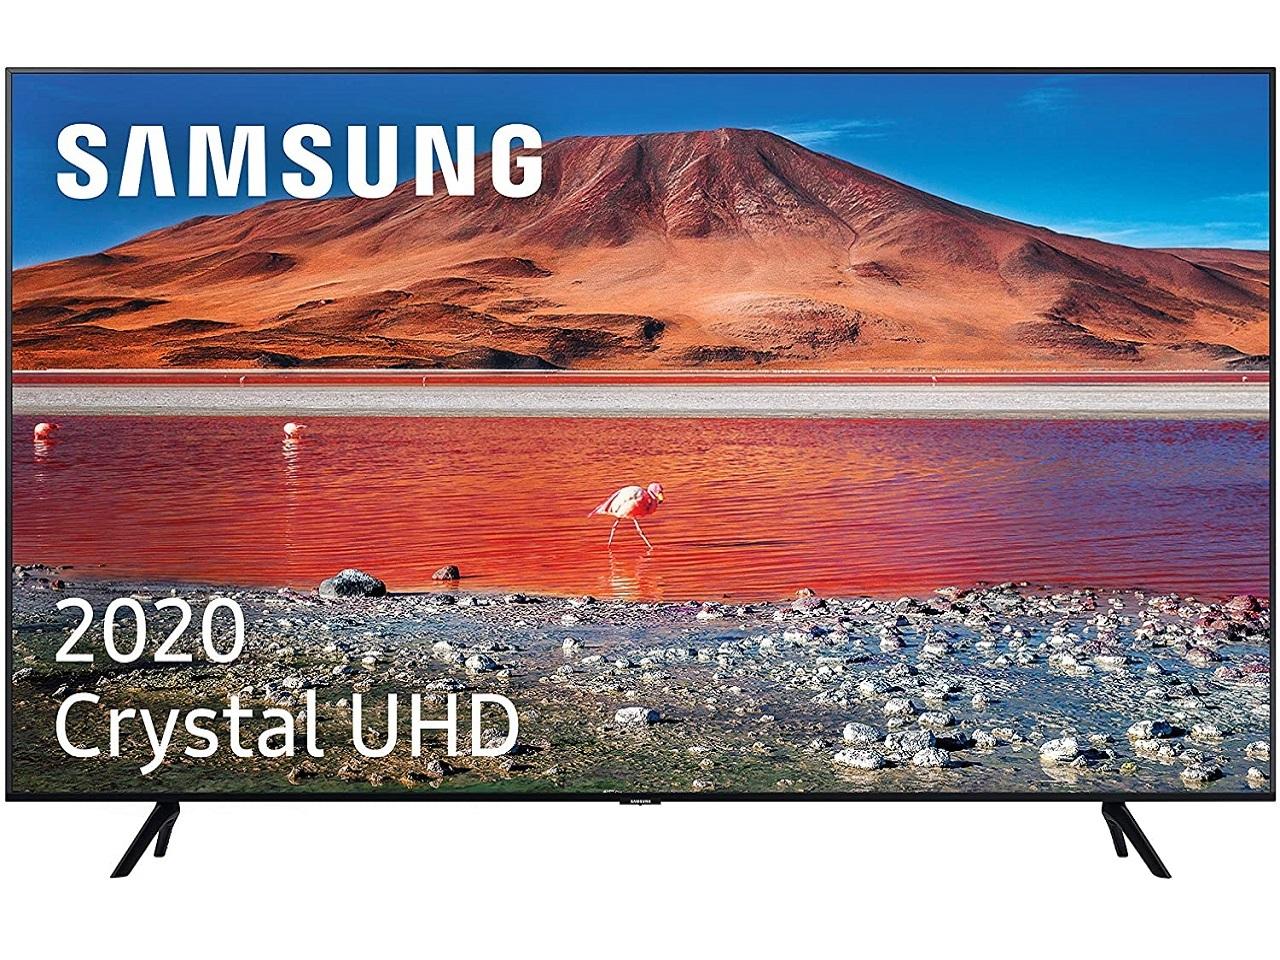 Samsung Crystal UHD 2020 43TU7005 1